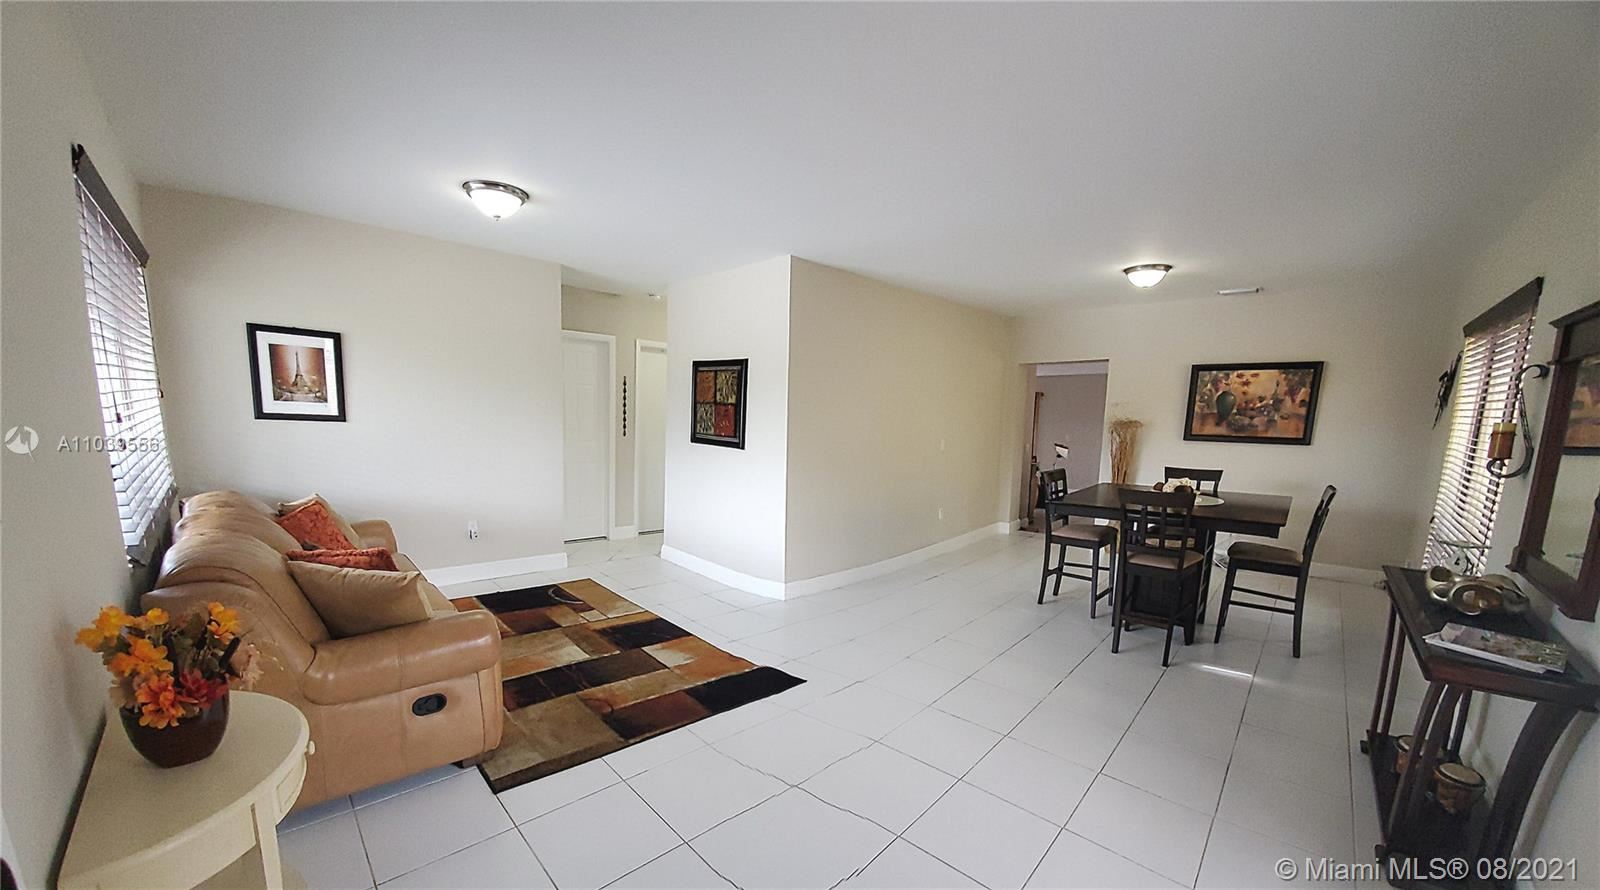 Photo of 9480 SW 36th St, Miami, FL 33165 (MLS # A11039556)